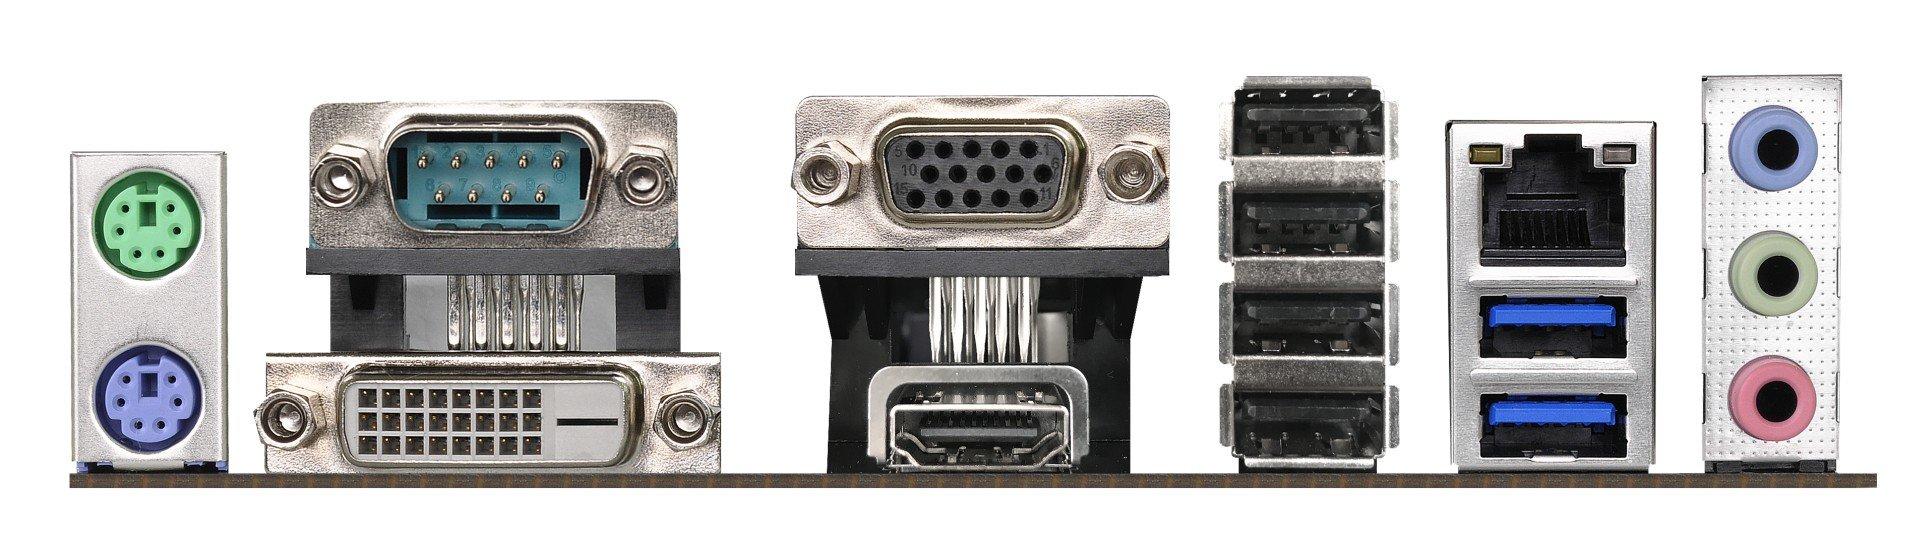 ASRock H310M-HDVP